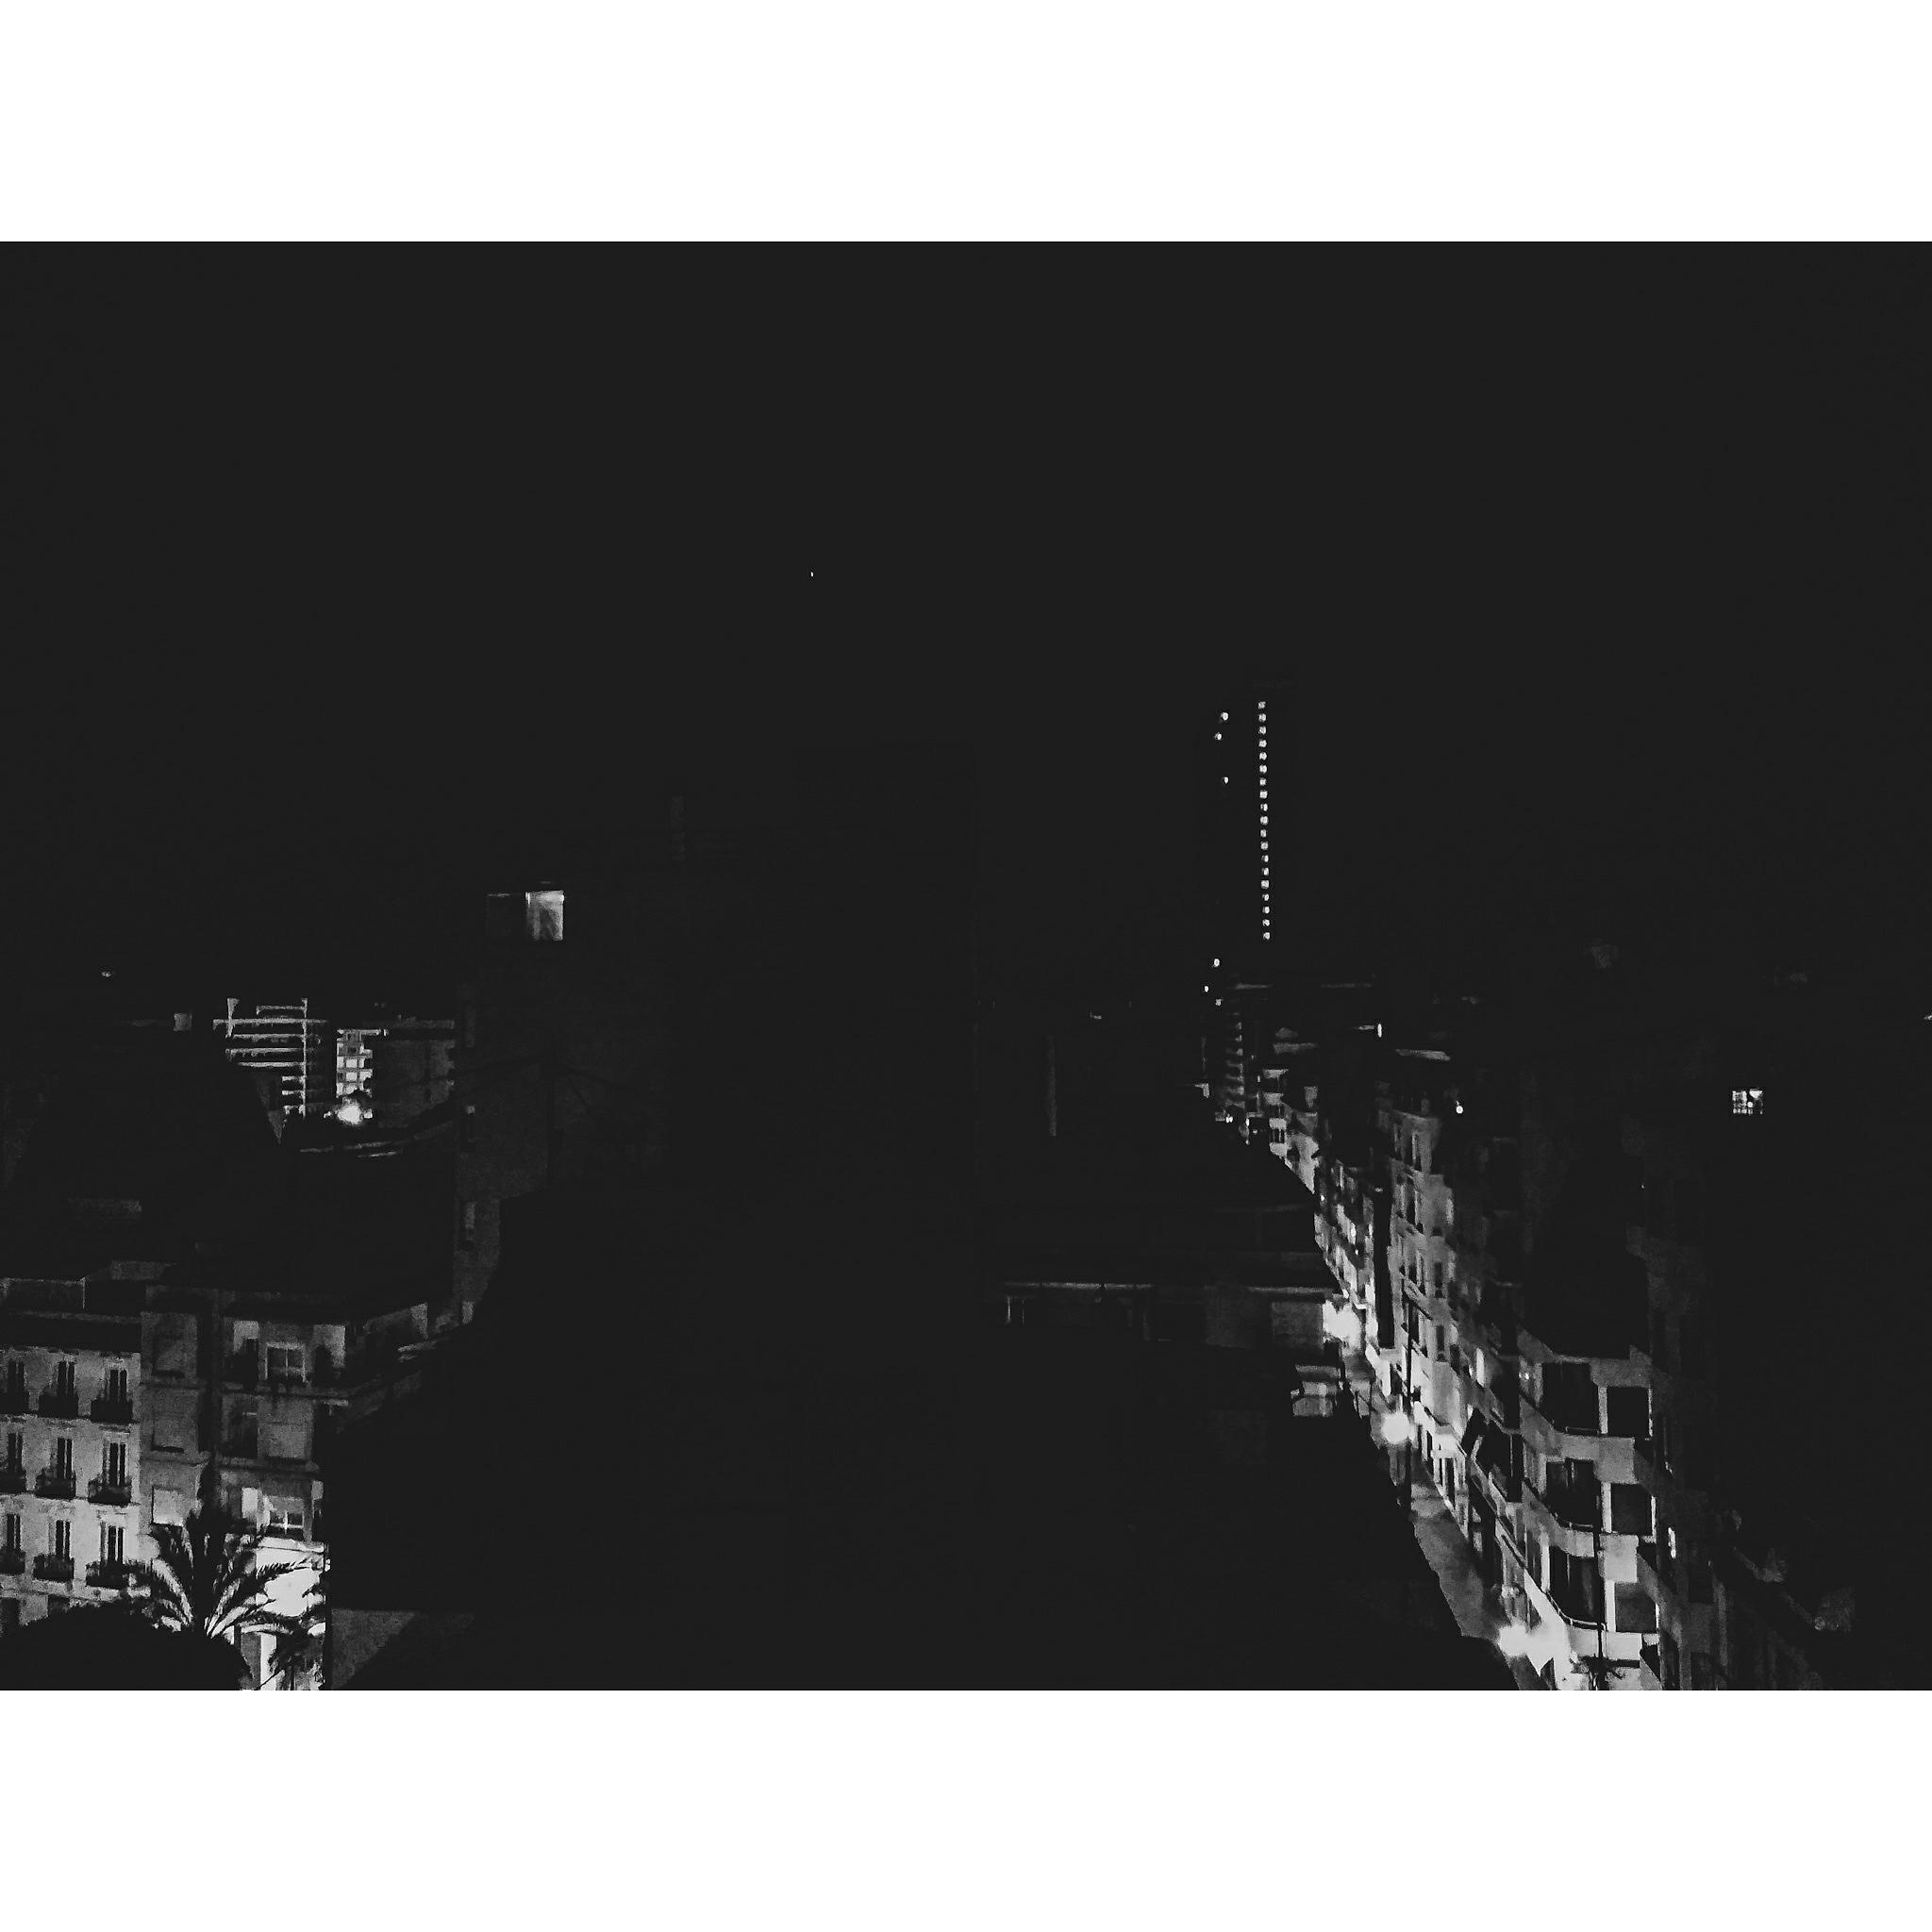 summer night by analogic trip